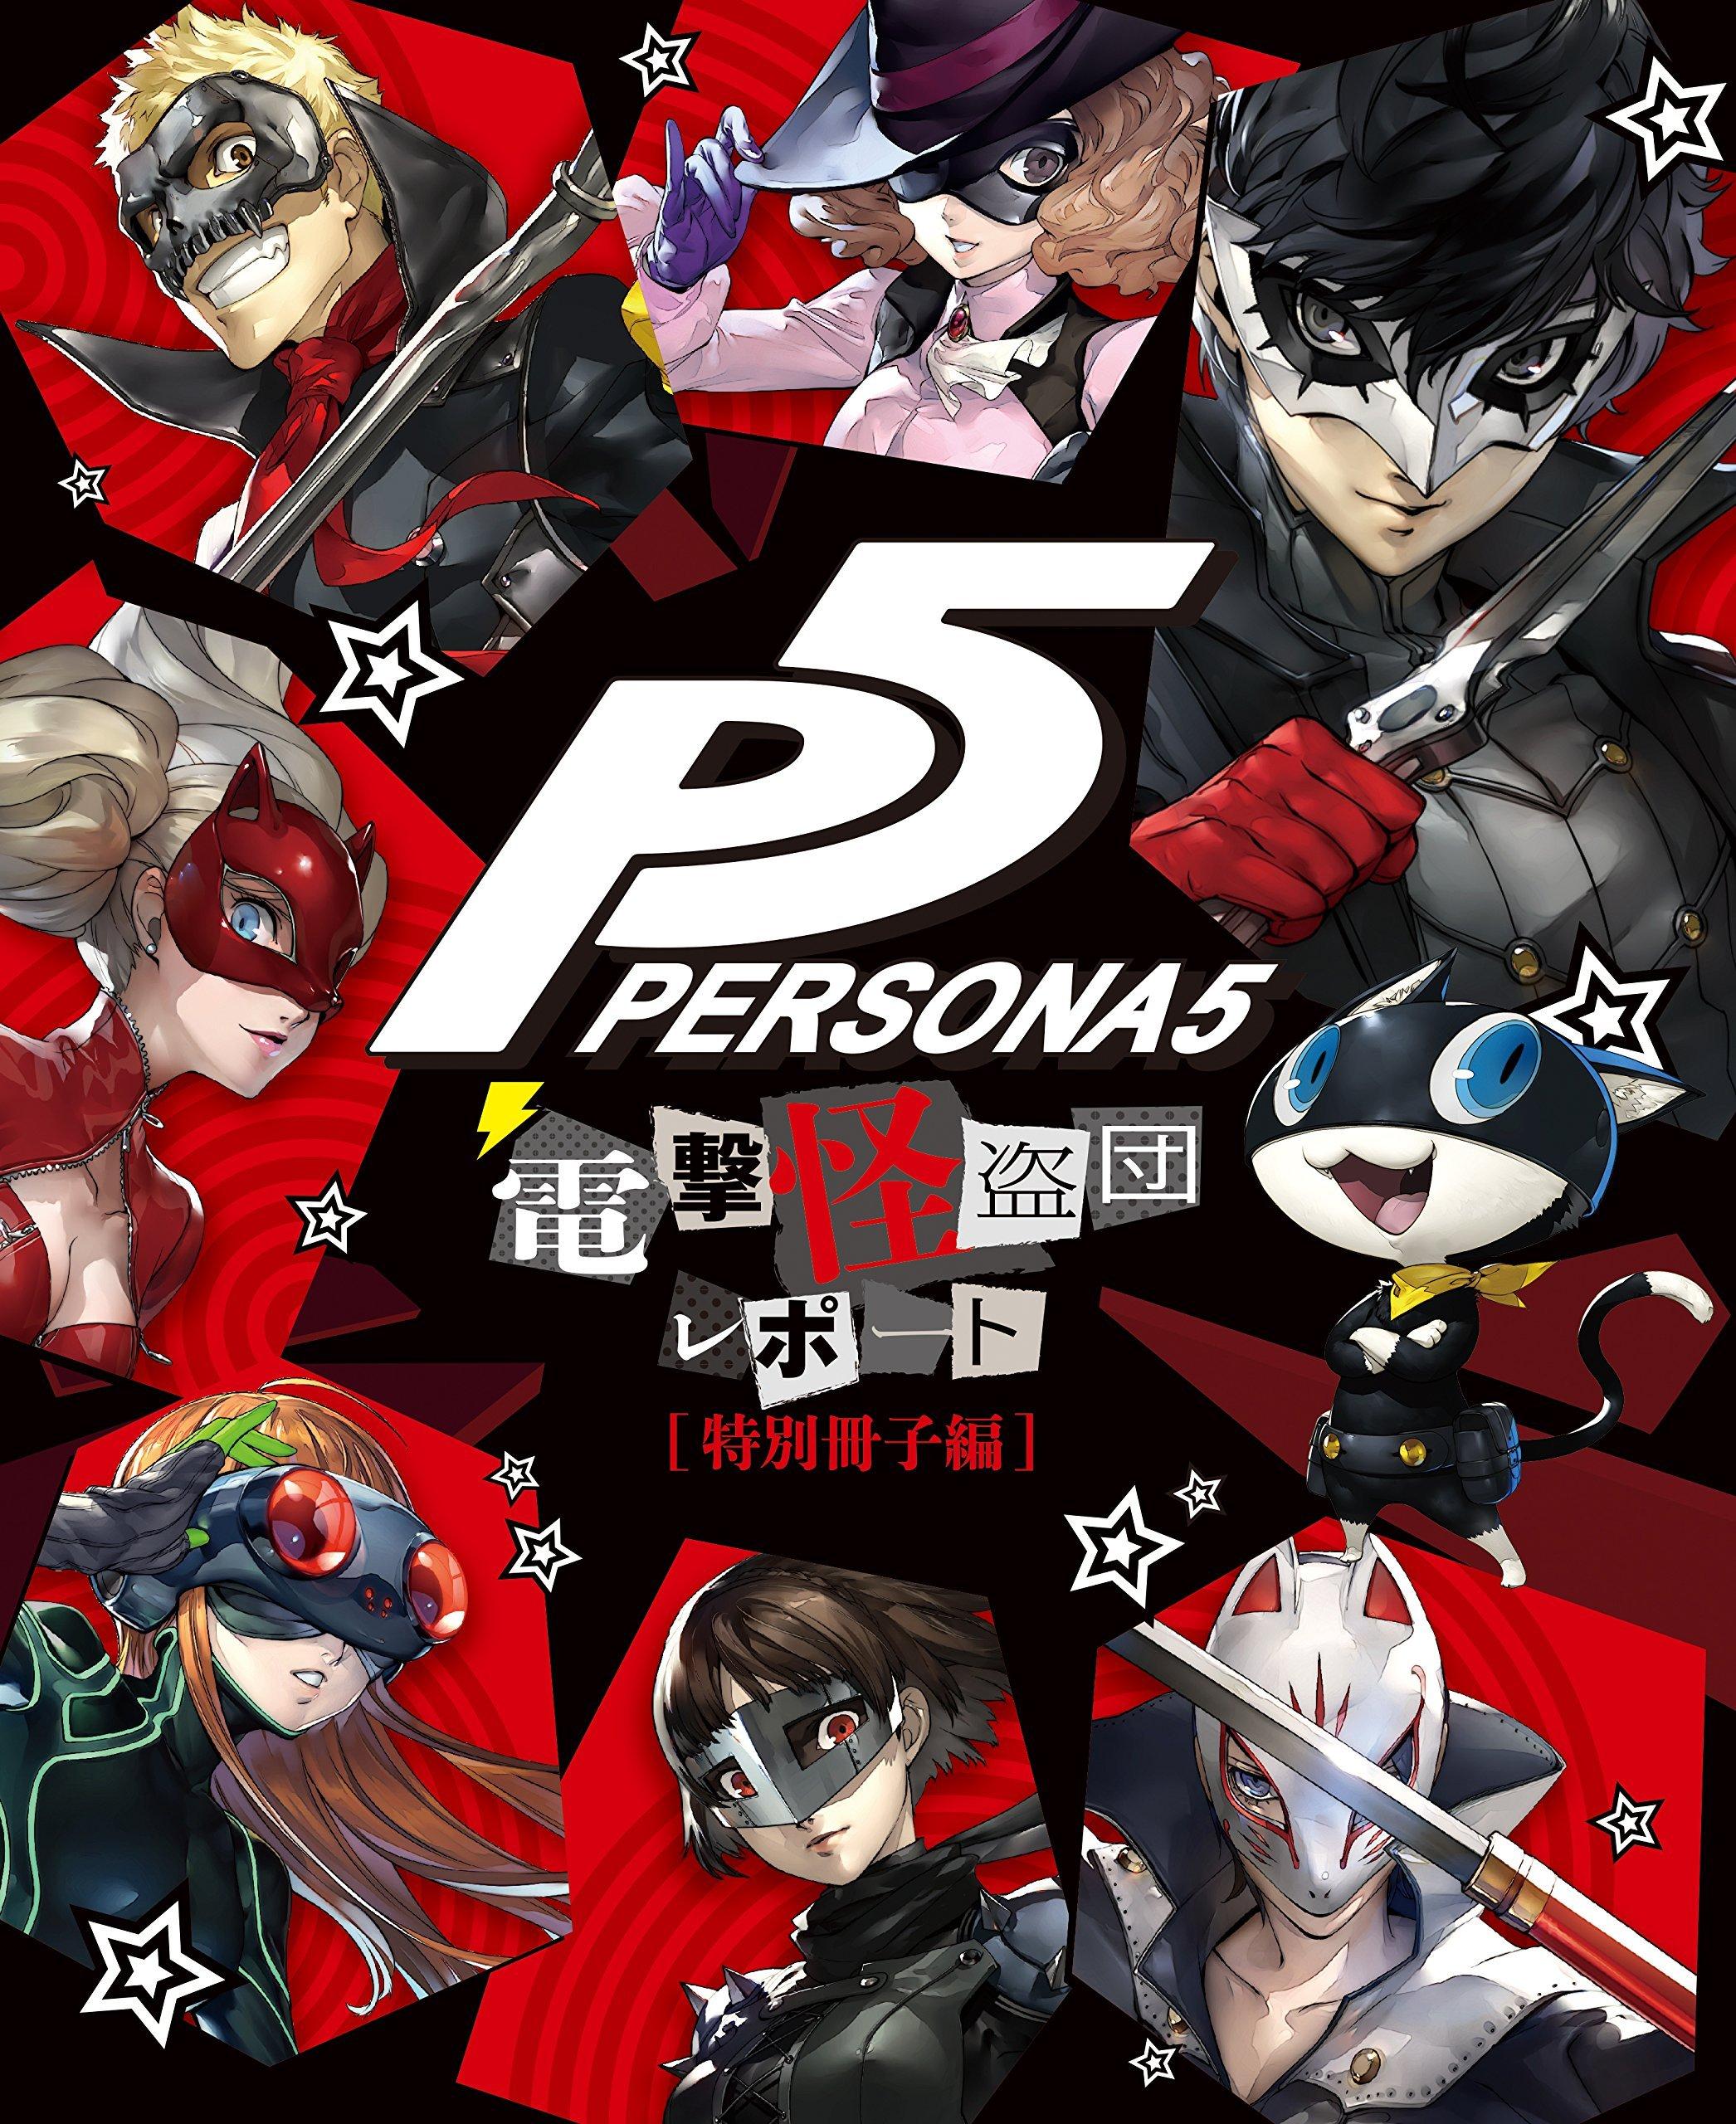 Persona 5 - Dengeki Kaitoudan Report (Vol.623 supplement) (October 13, 2016)